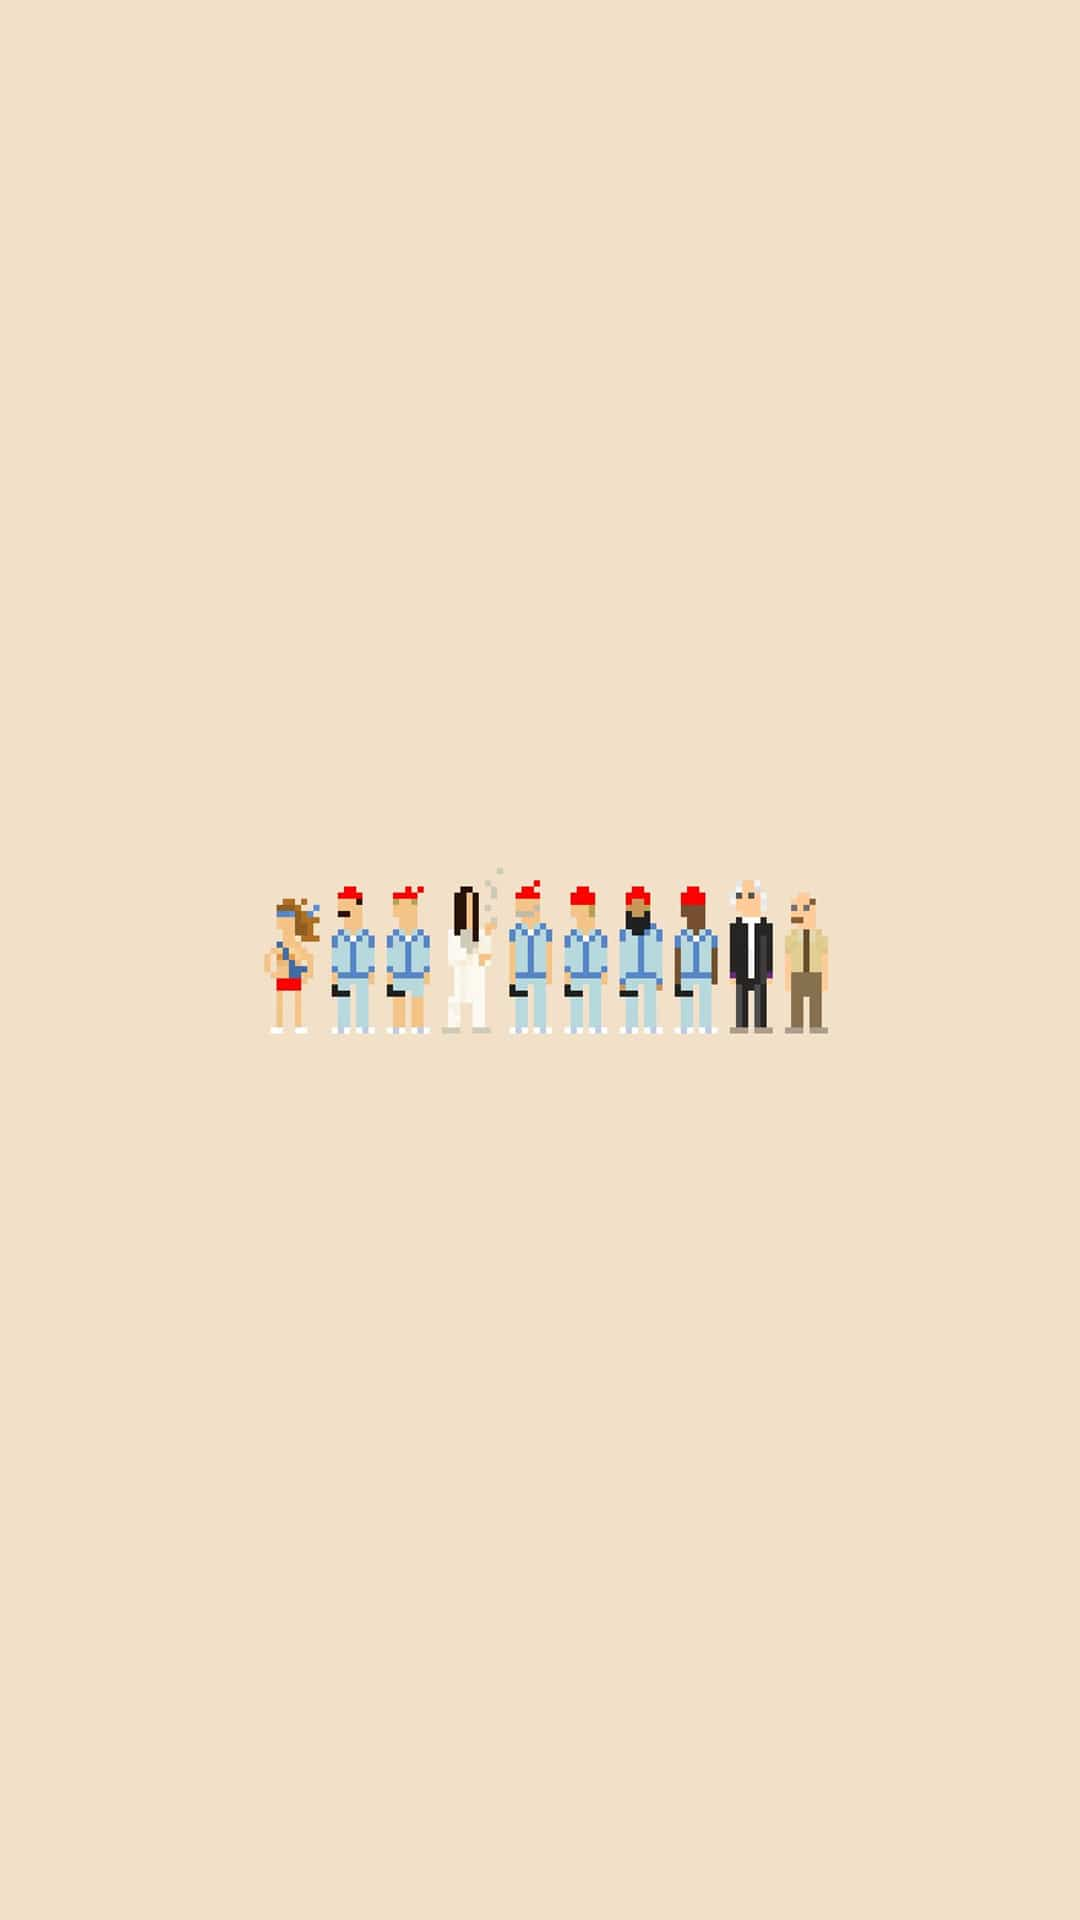 Minimalist Kpop Wallpapers Top Free Minimalist Kpop Backgrounds Wallpaperaccess